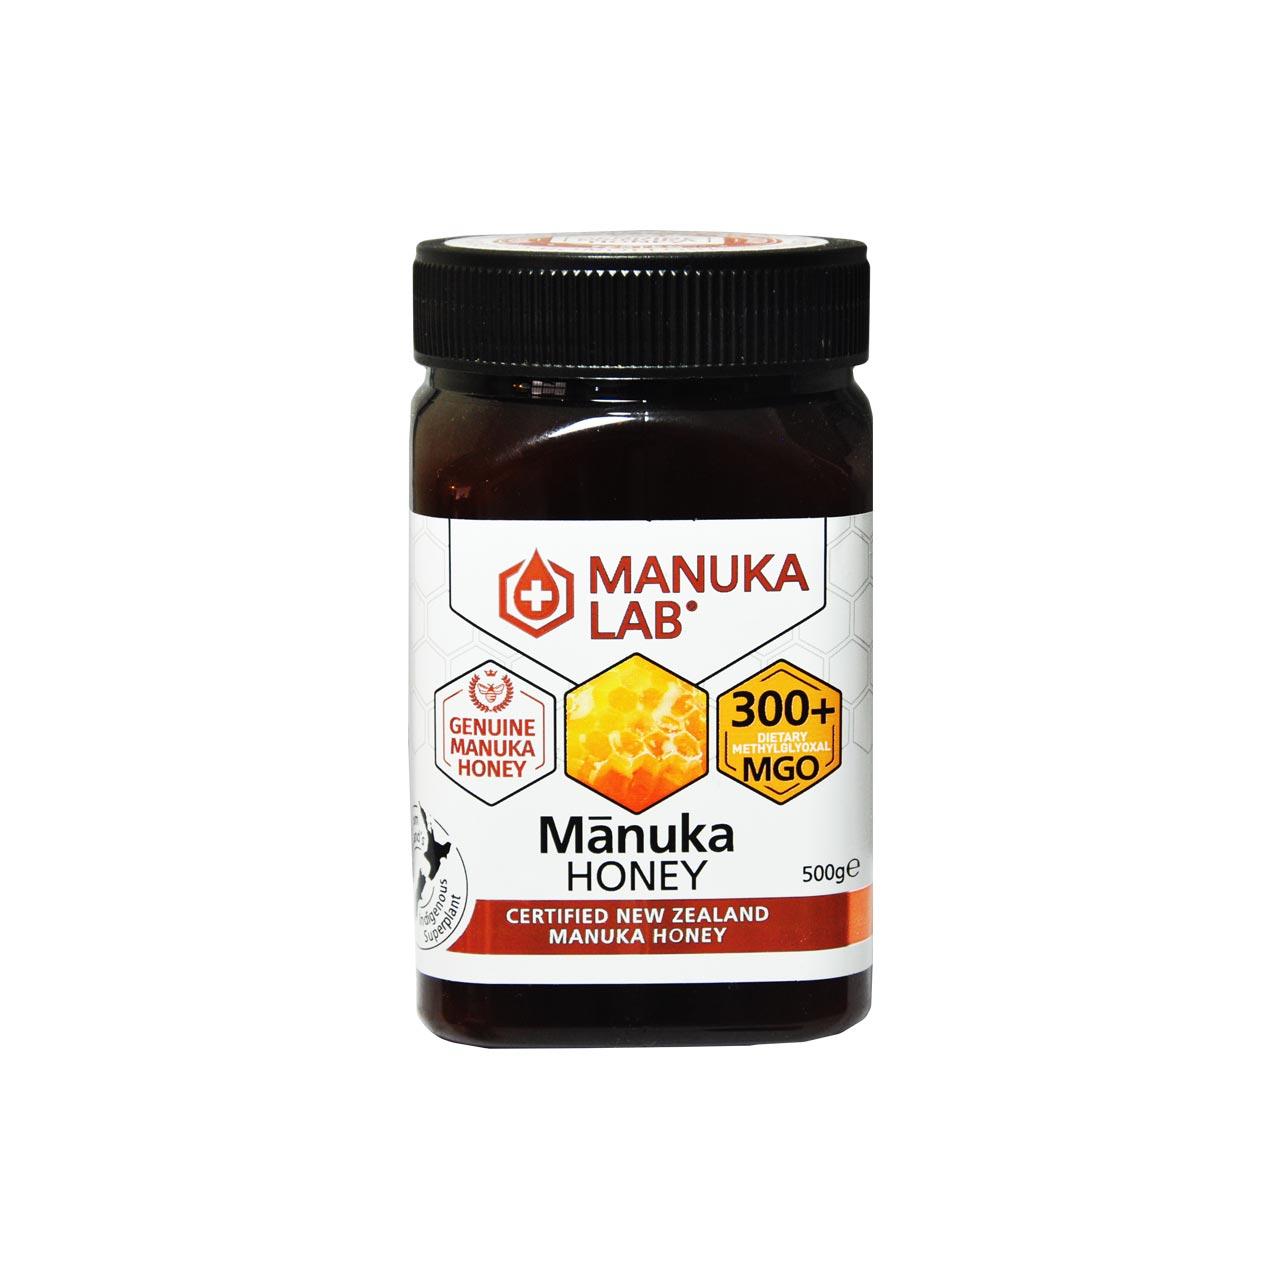 عسل مانوکا +۳۰۰ MGO